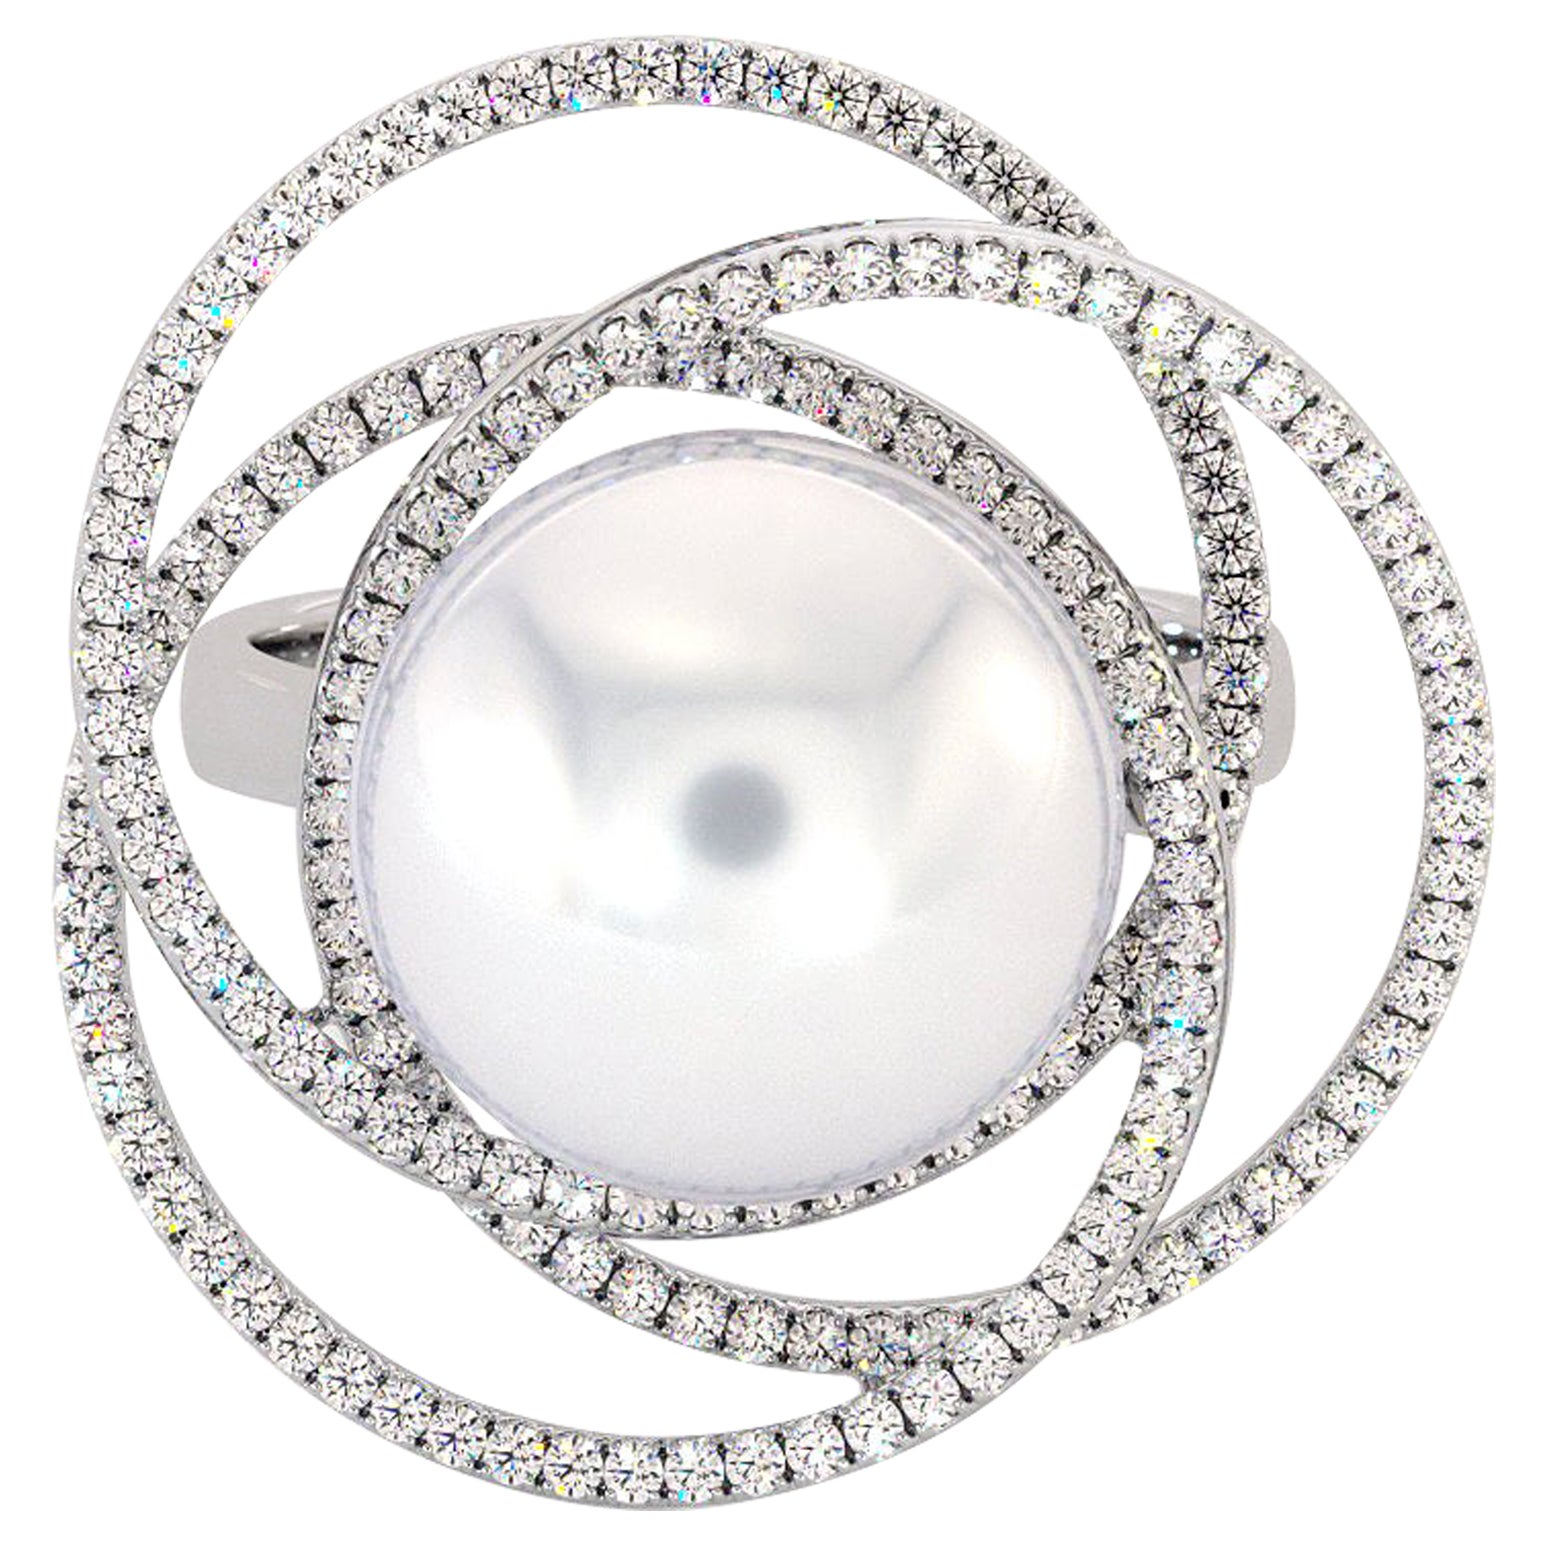 18K White Gold South Sea White Pearl Diamonds Ring